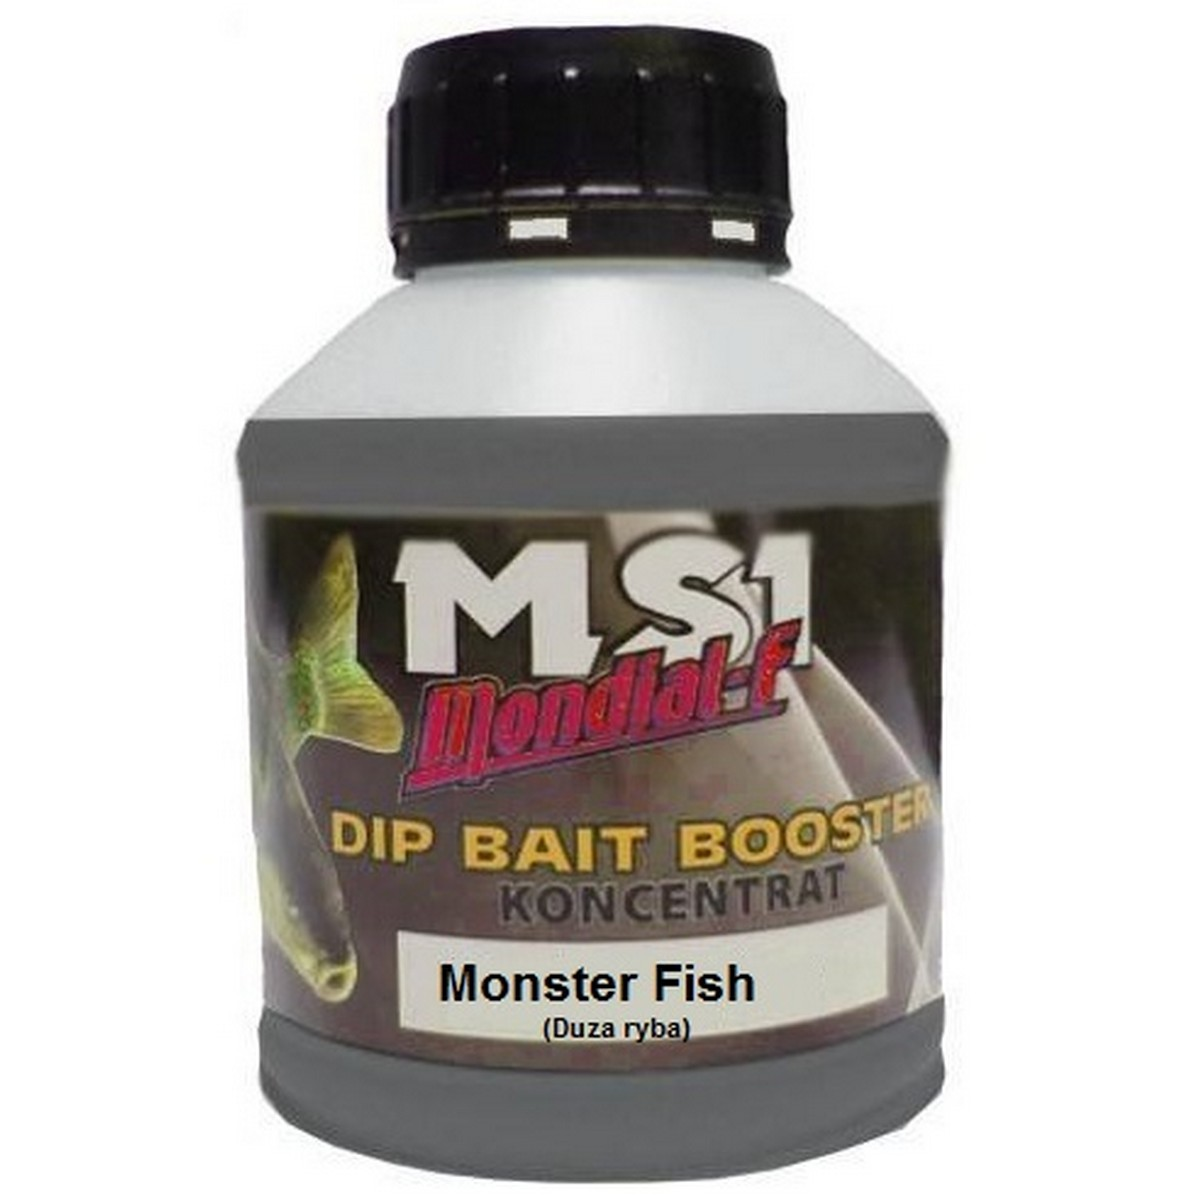 Дип Mondial-F Dip Bait Booster Monster Fish